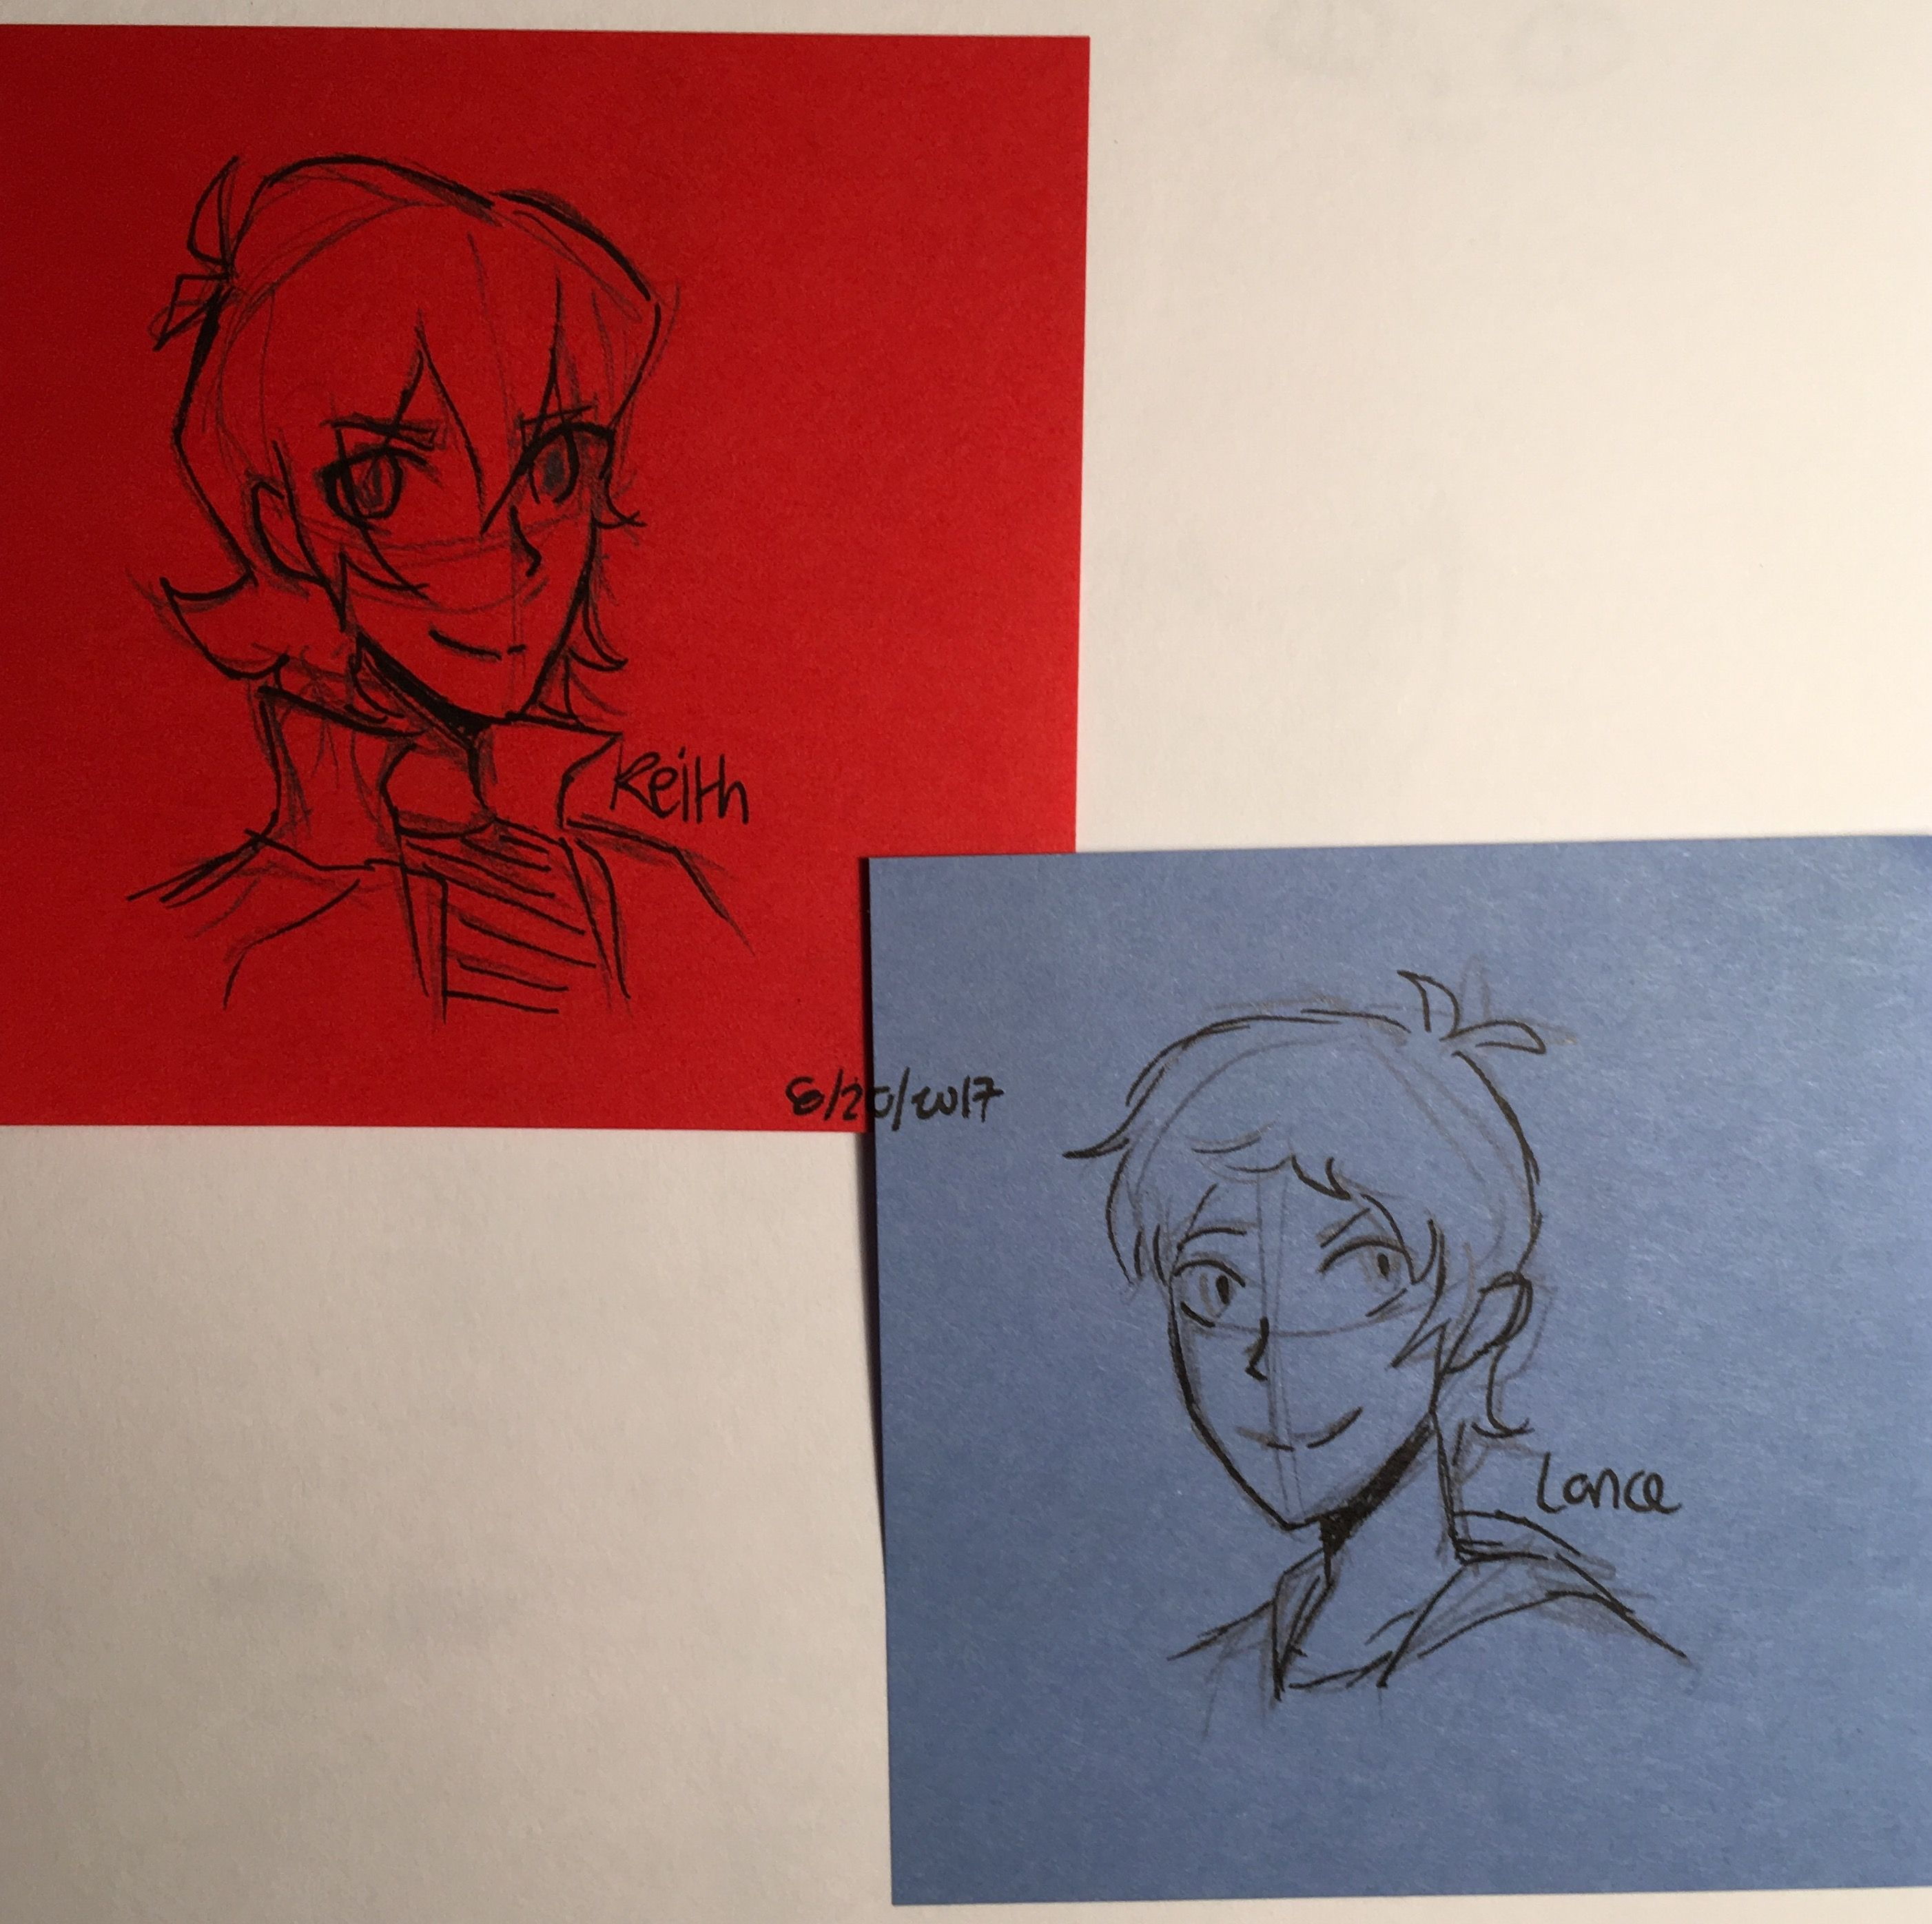 Some Keith & Lance doodles on Postit notes Artist, Art